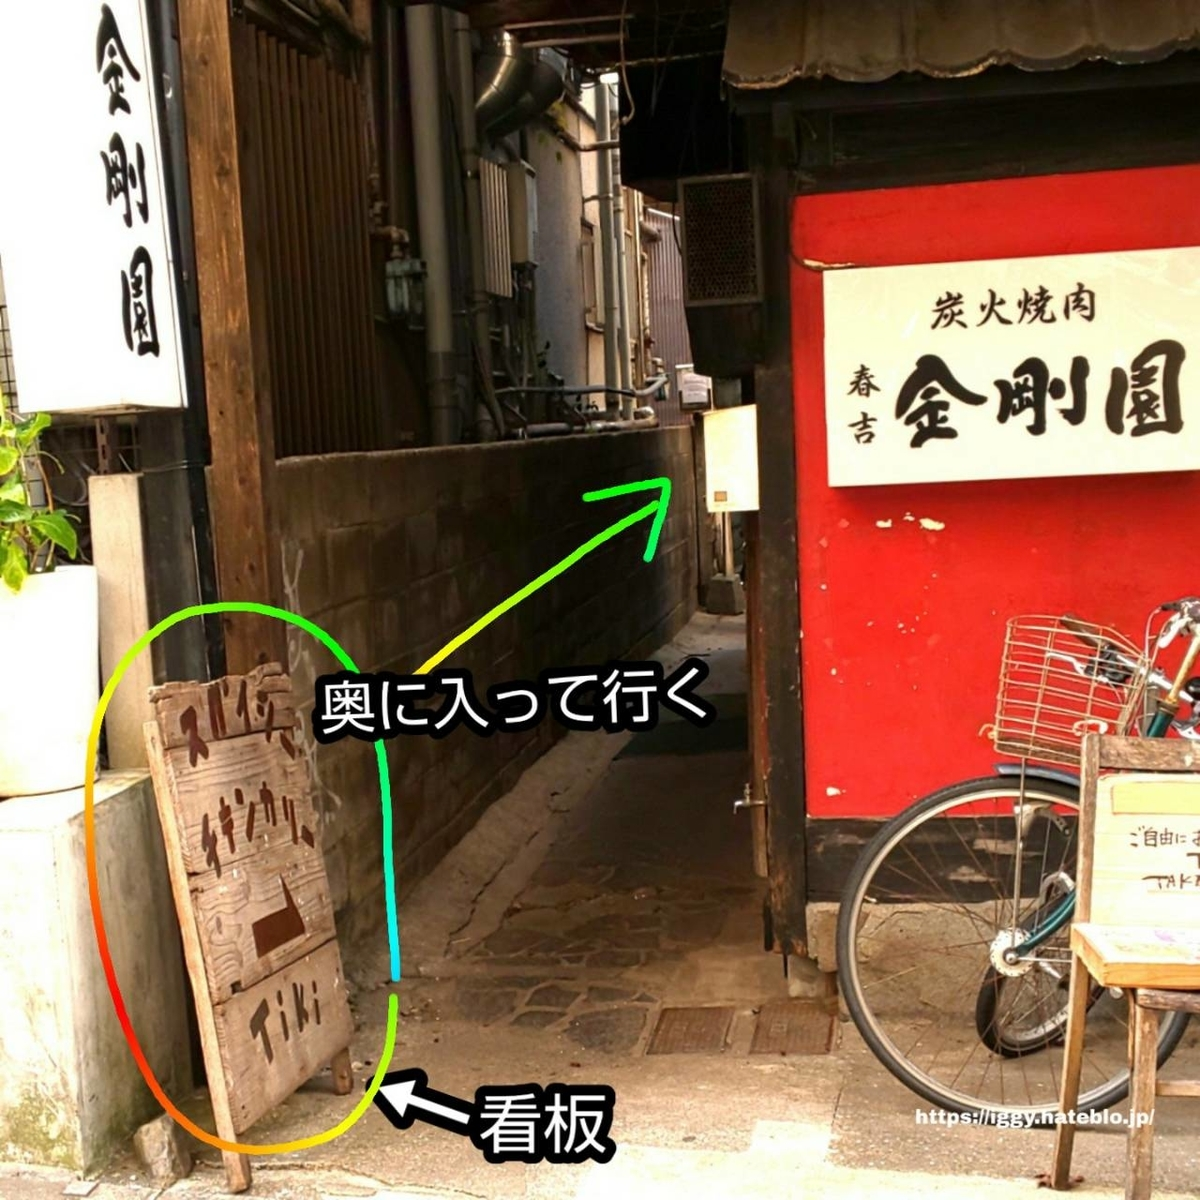 TiKi入り口 iggy2019